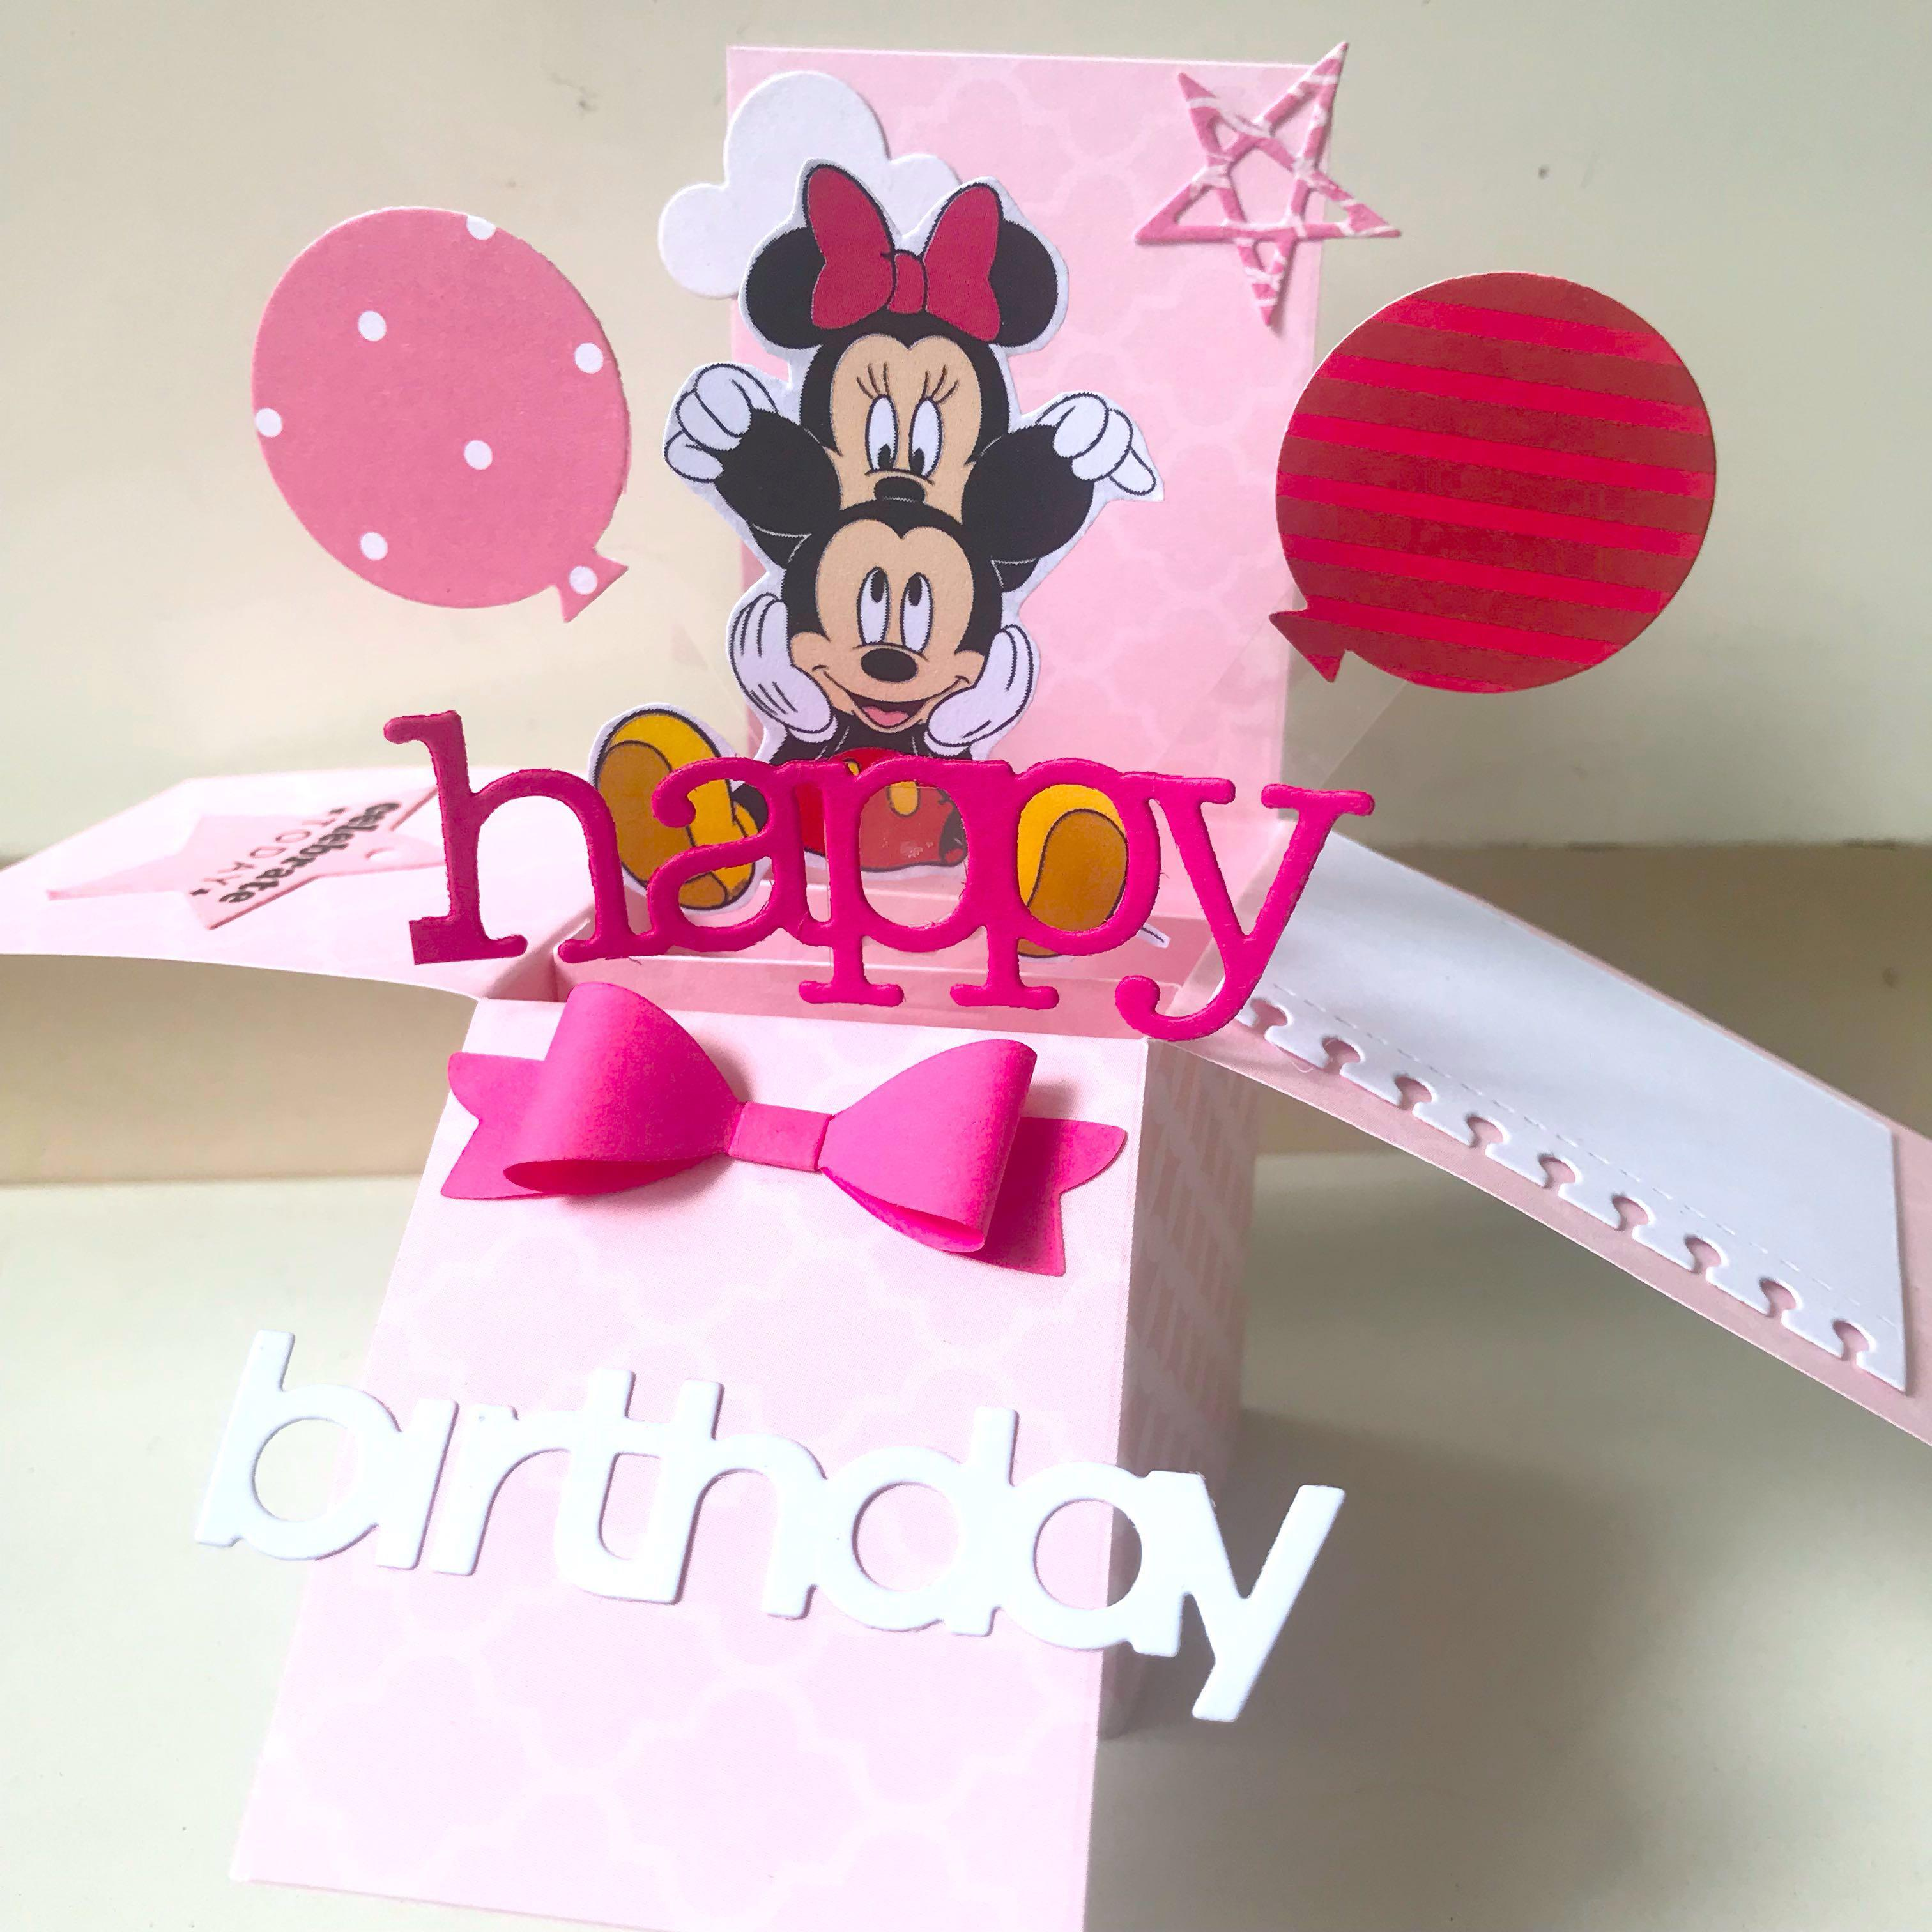 Happy birthday Mickey and Minnie Mouse handmade Pop Up card